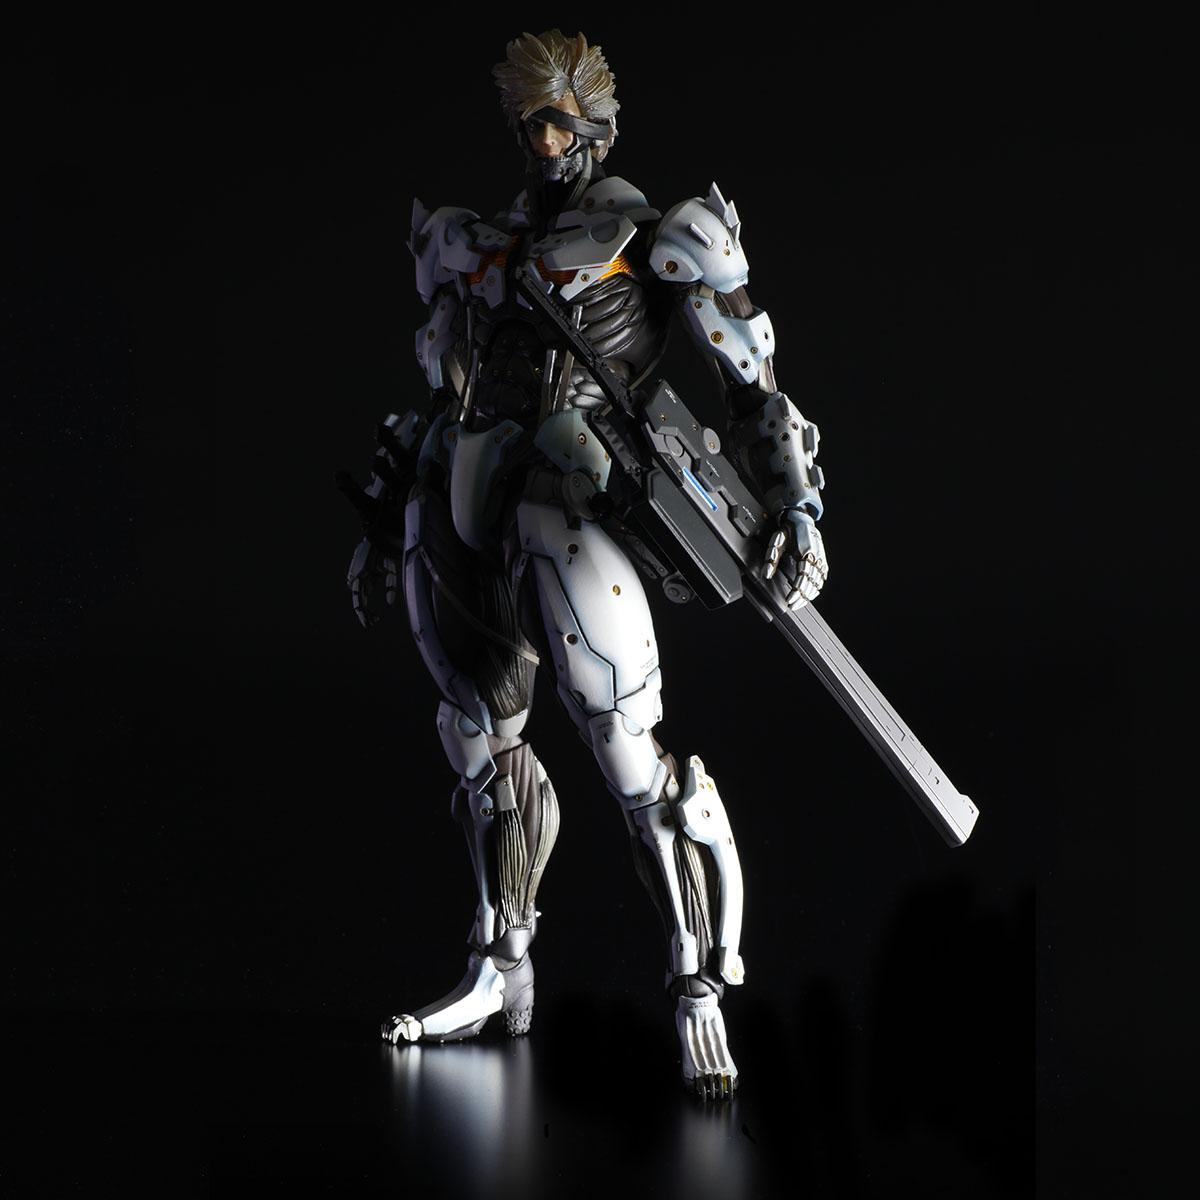 Eine coole Figur. Streng limitiert. (Foto: Konami)